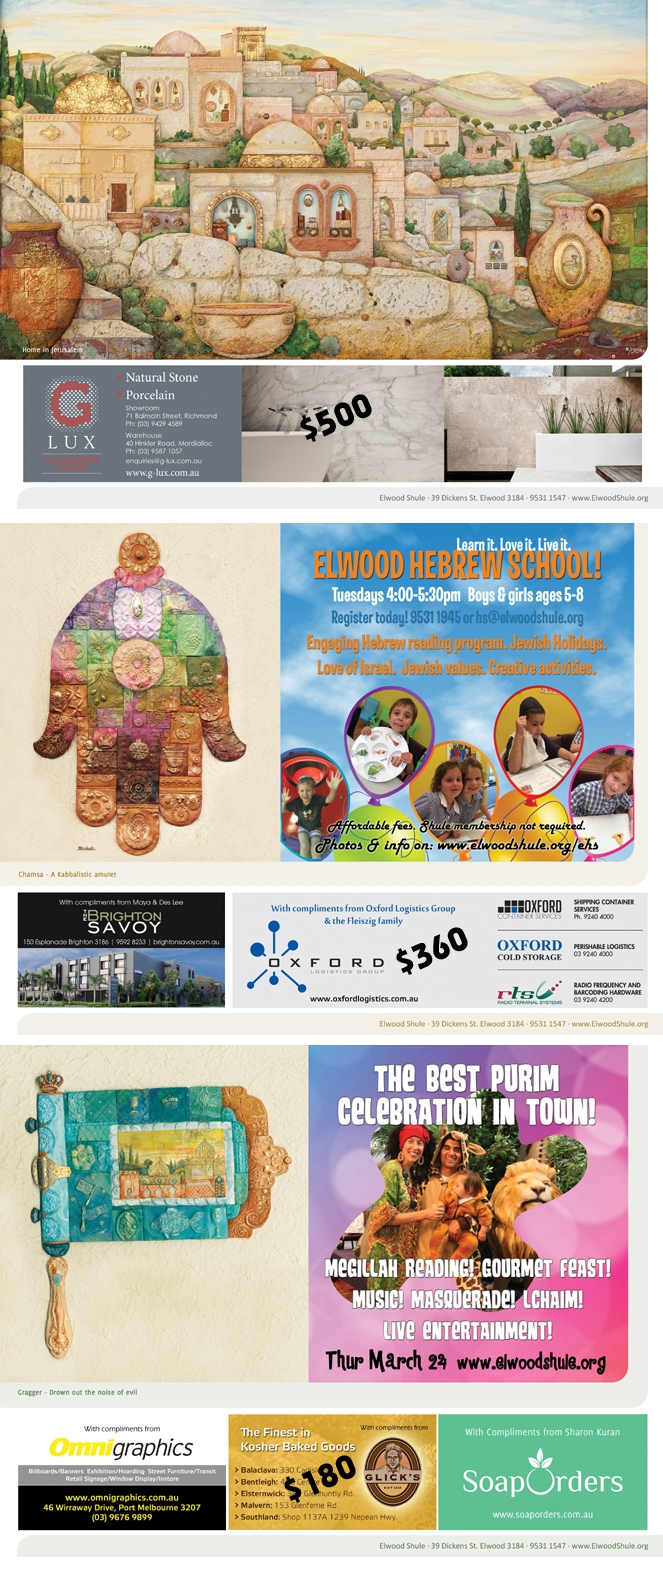 Sample pages web.jpg